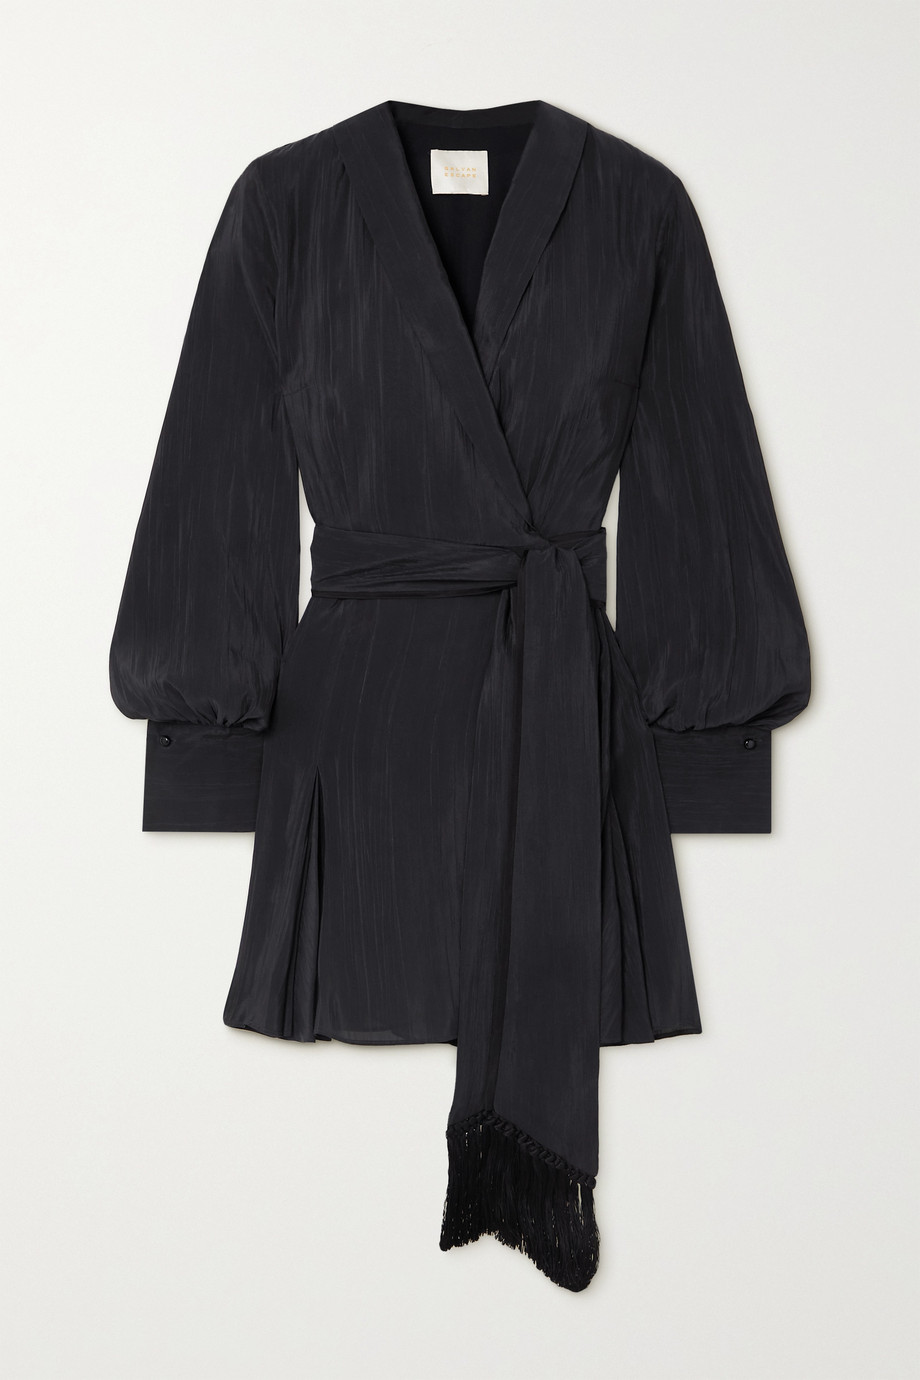 Galvan Cabana crinkled satin-voile mini wrap dress